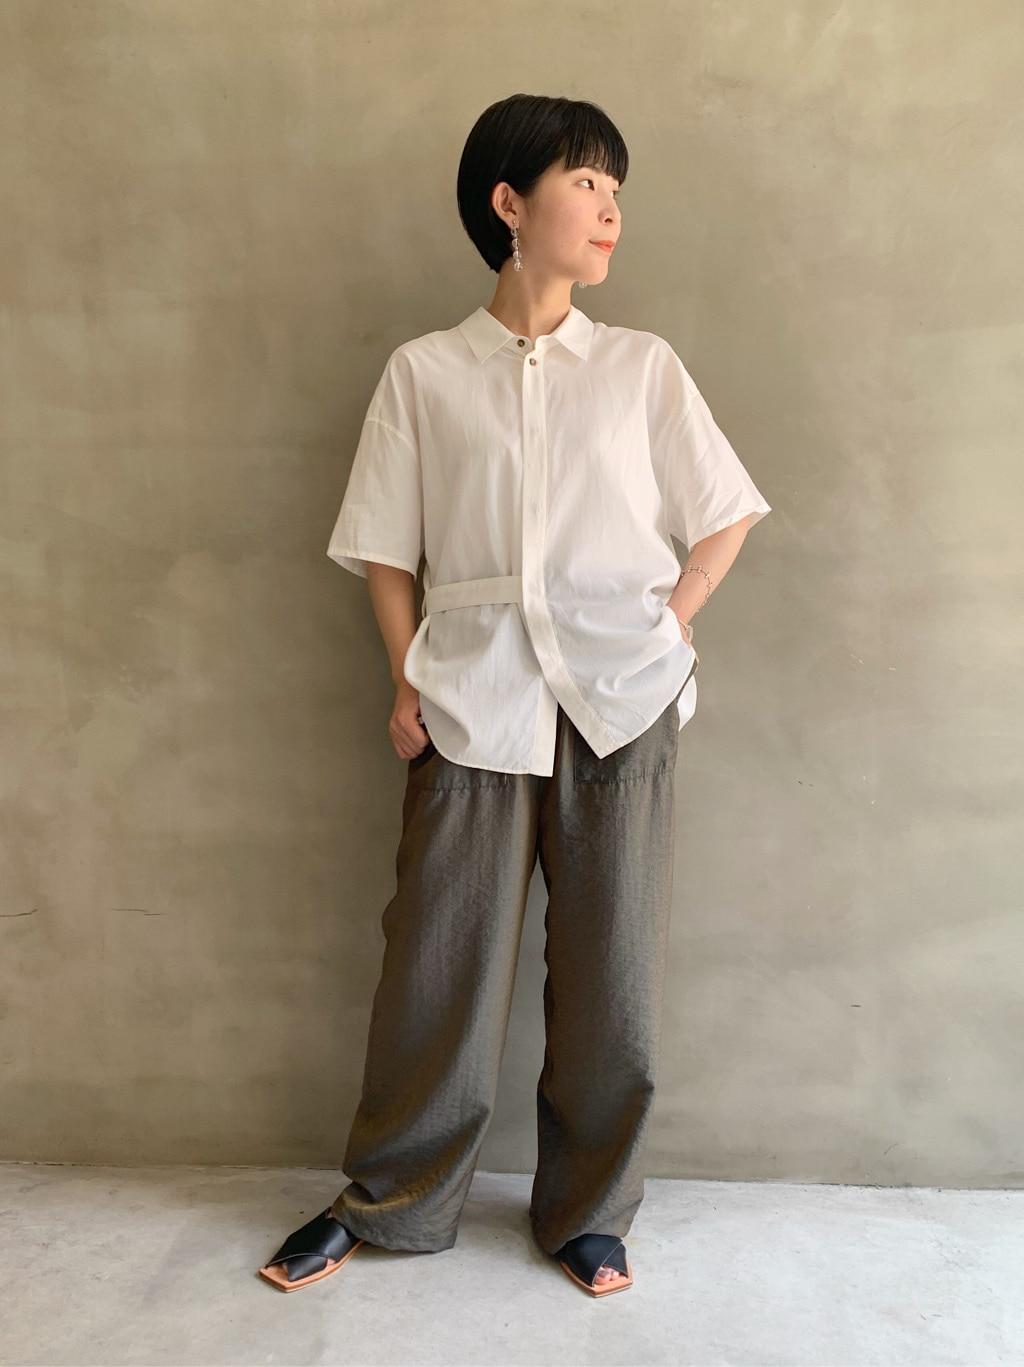 caph troupe 福岡薬院路面 身長:155cm 2020.08.06